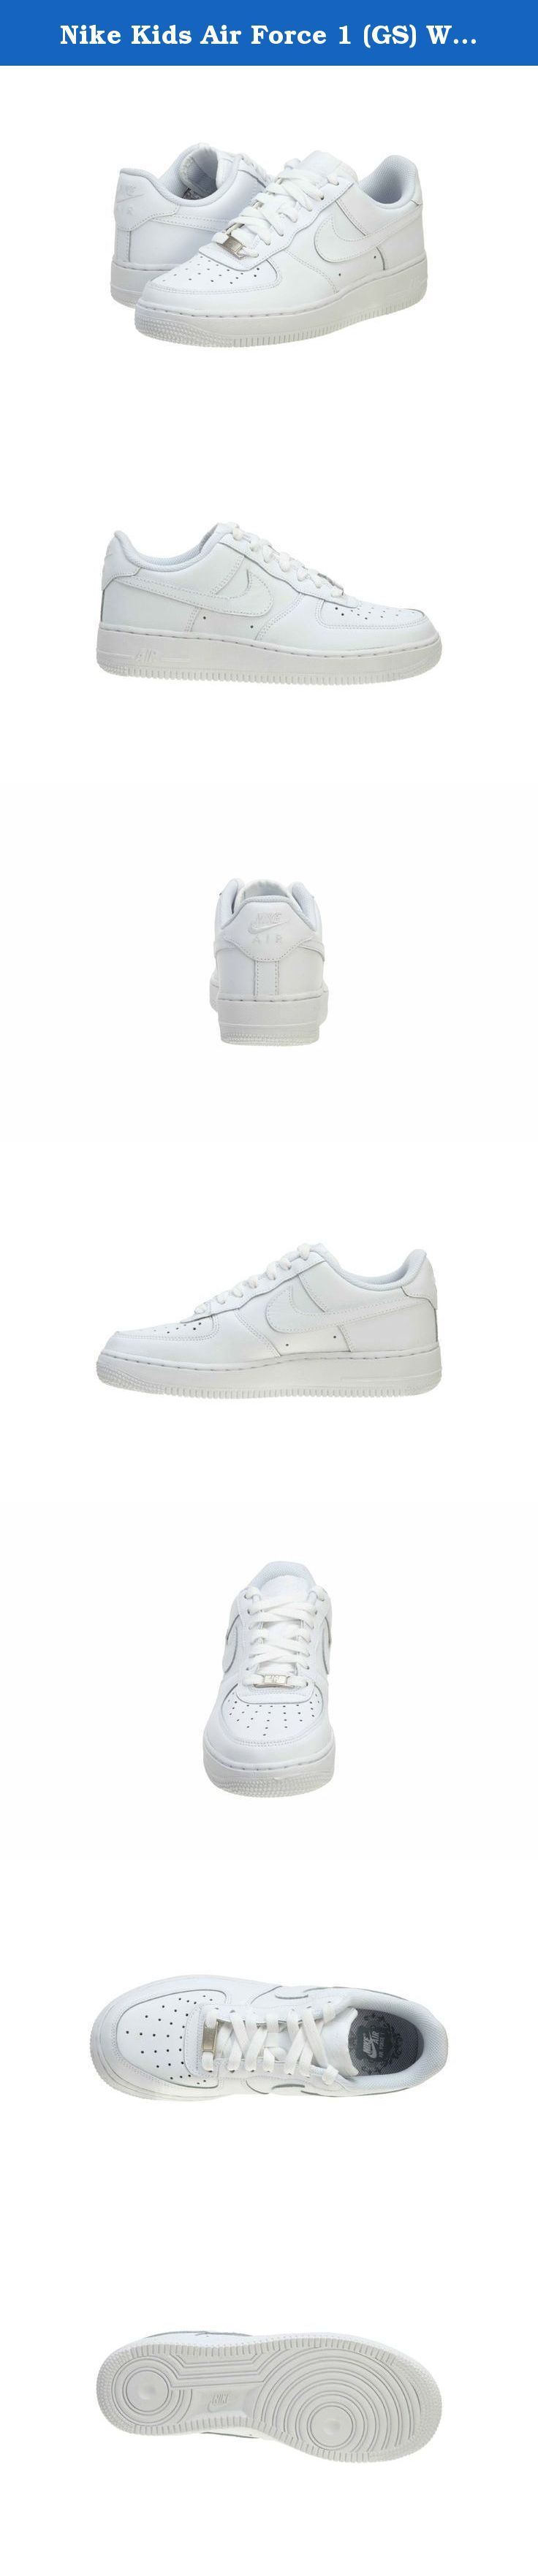 Nike Kids Air Force 1 (GS) White/White/White Basketball Shoe 6 Kids US. Nike Air Force 1 (Gs) Big Kids Style # 314192.